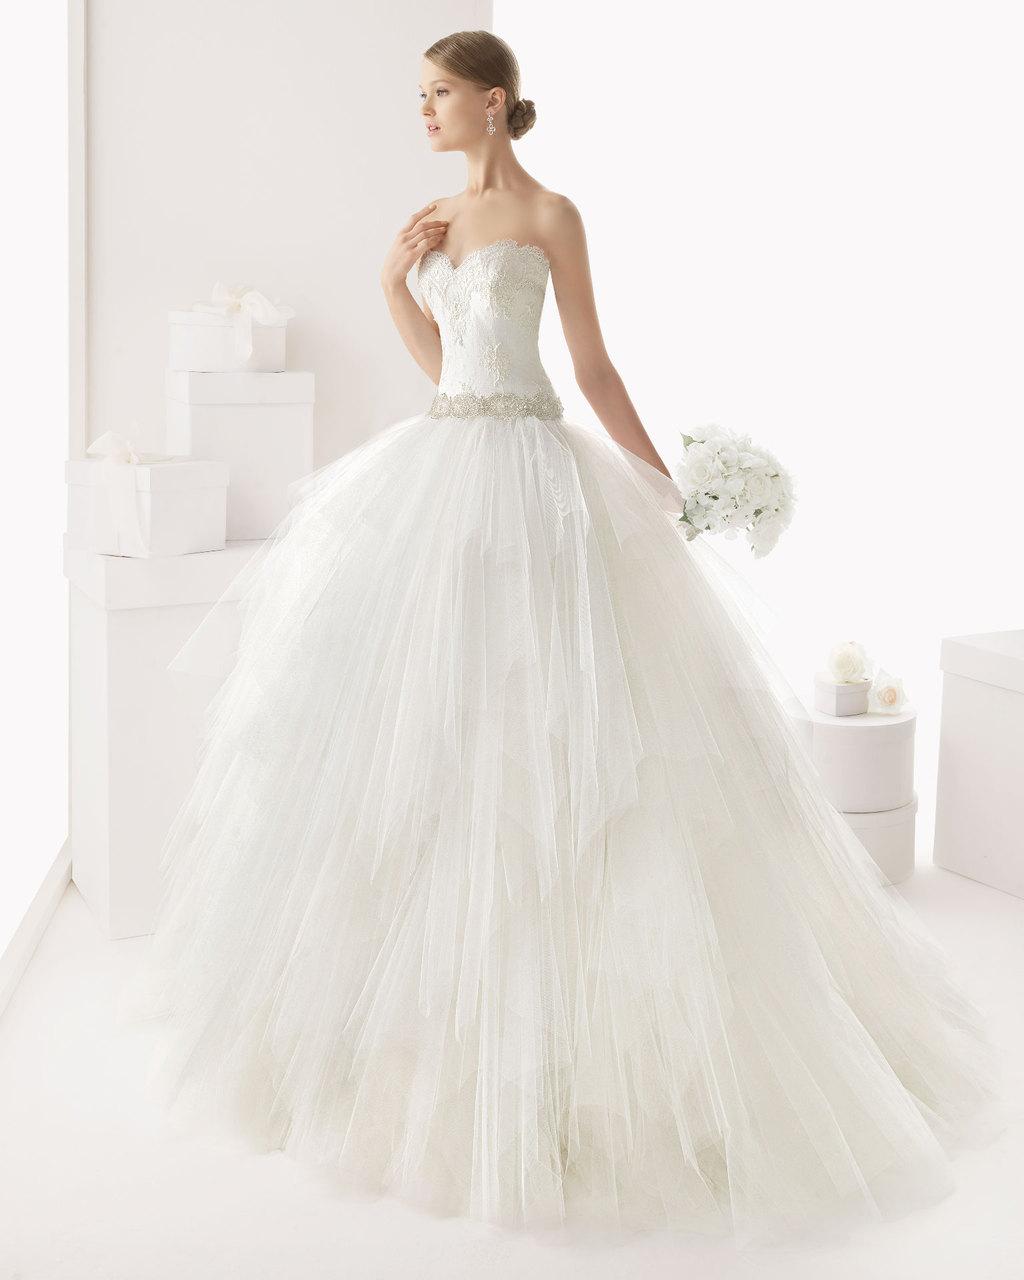 Rosa clara wedding dress 2014 bridal castro for Rosa clara wedding dresses 2014